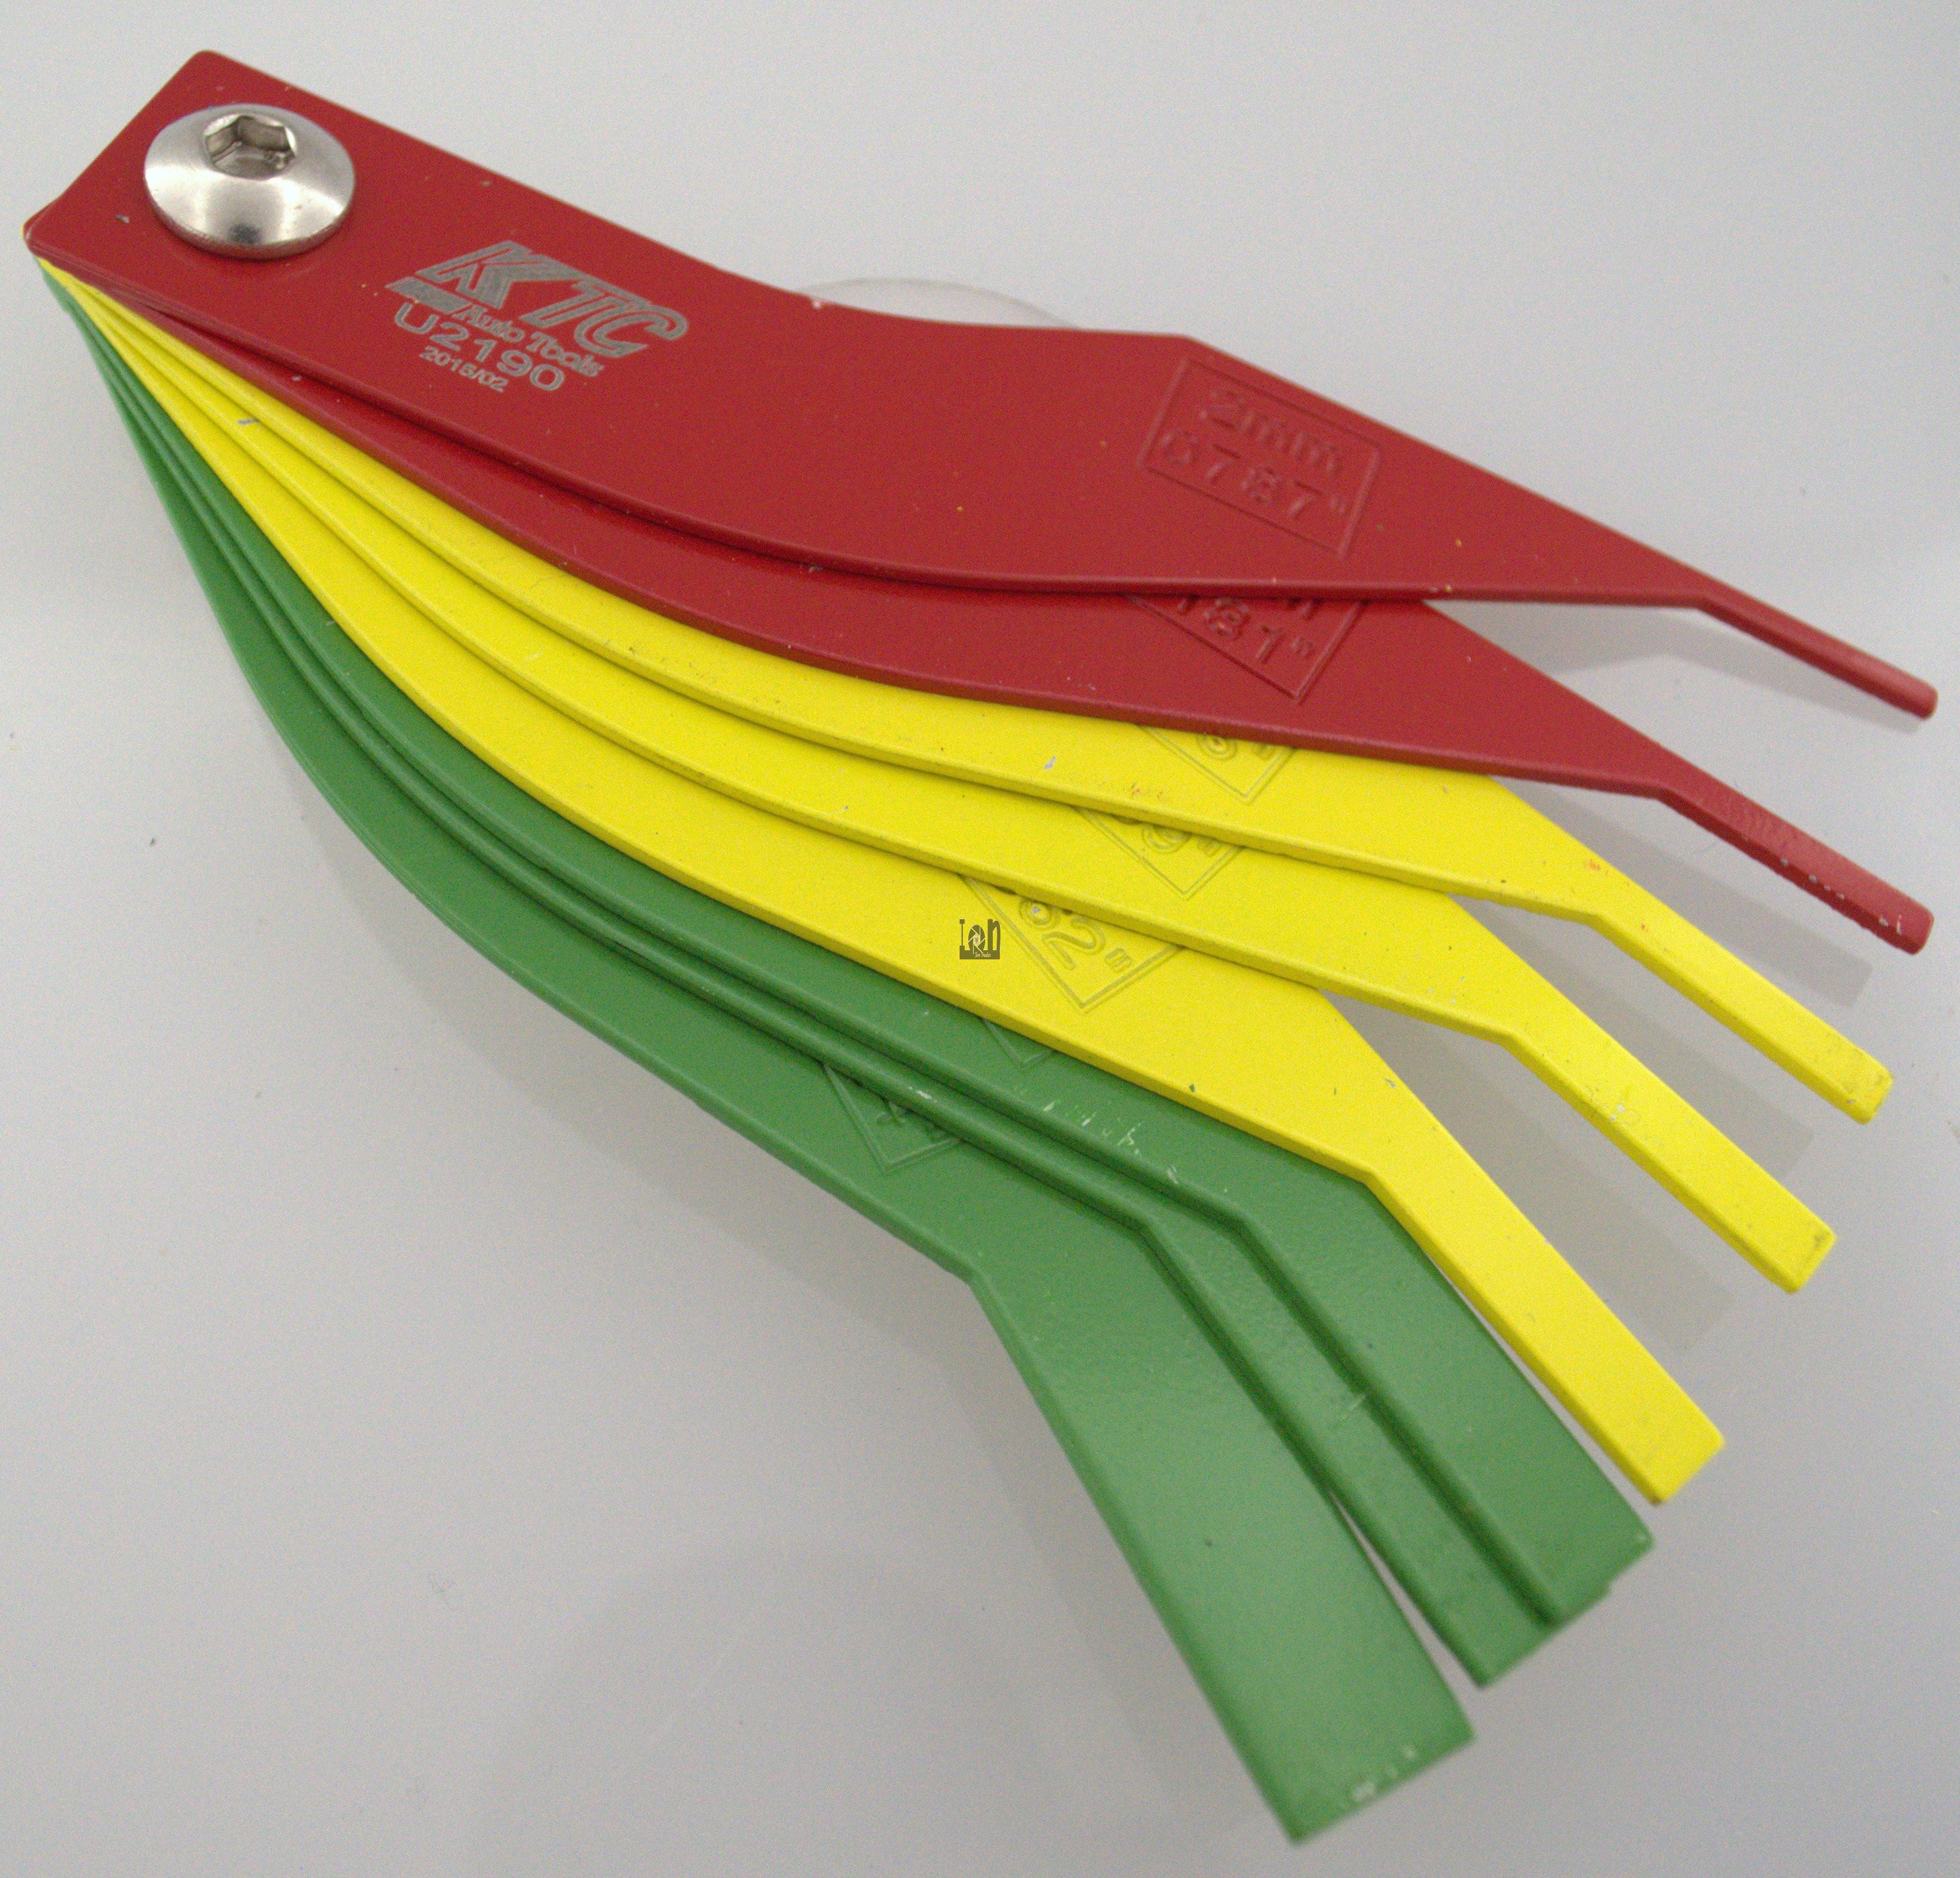 Brake Pad Feeler Gauge U2190 KTC Tools Measuring